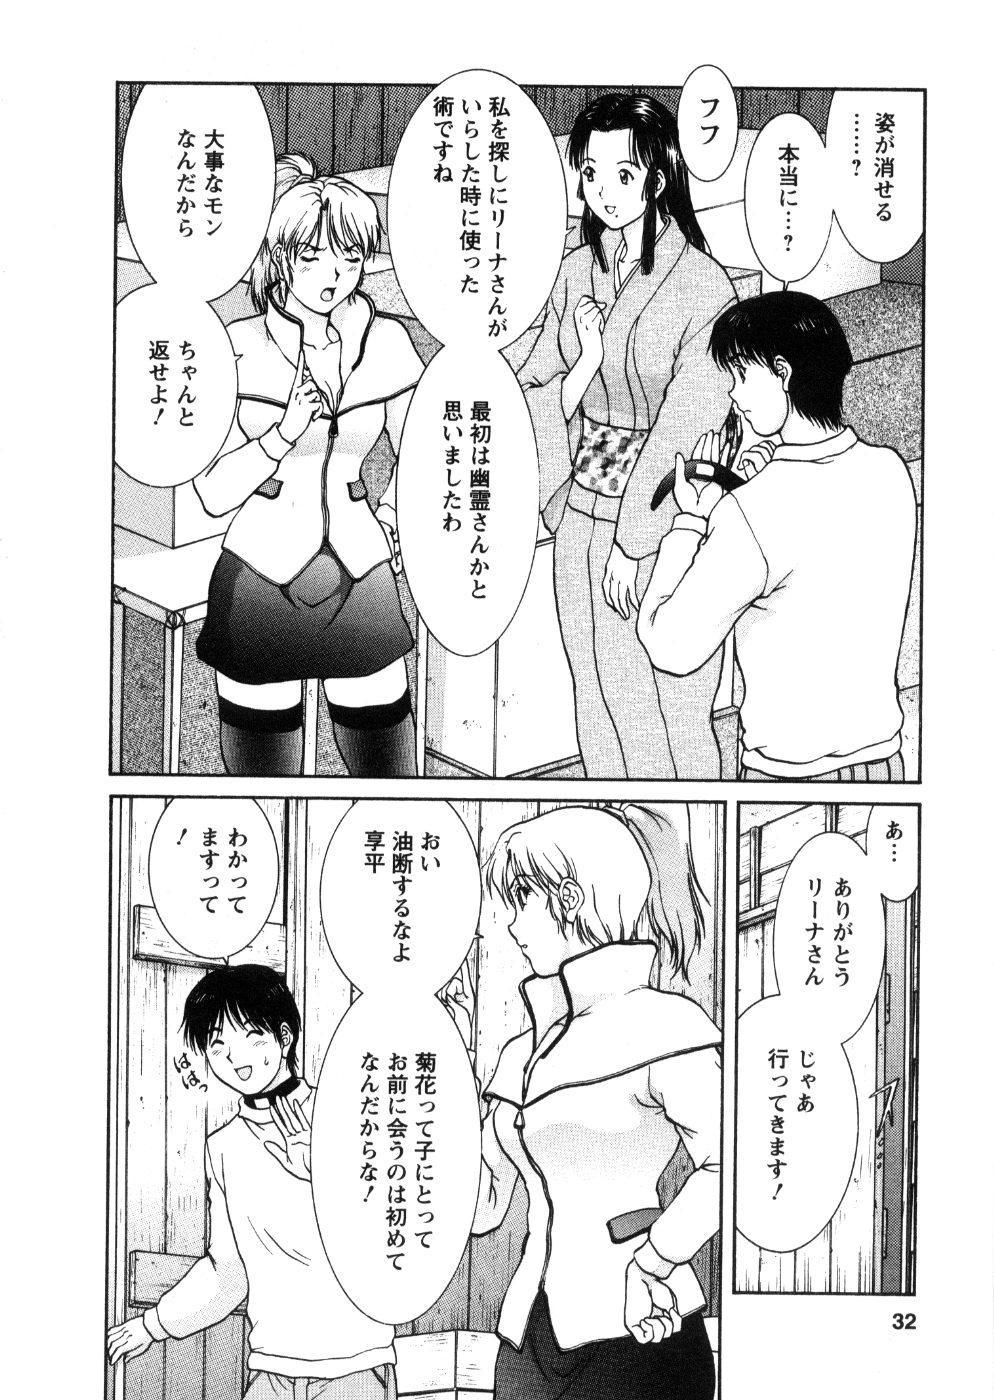 Oneechan-tachi ga Yatte Kuru 03 33